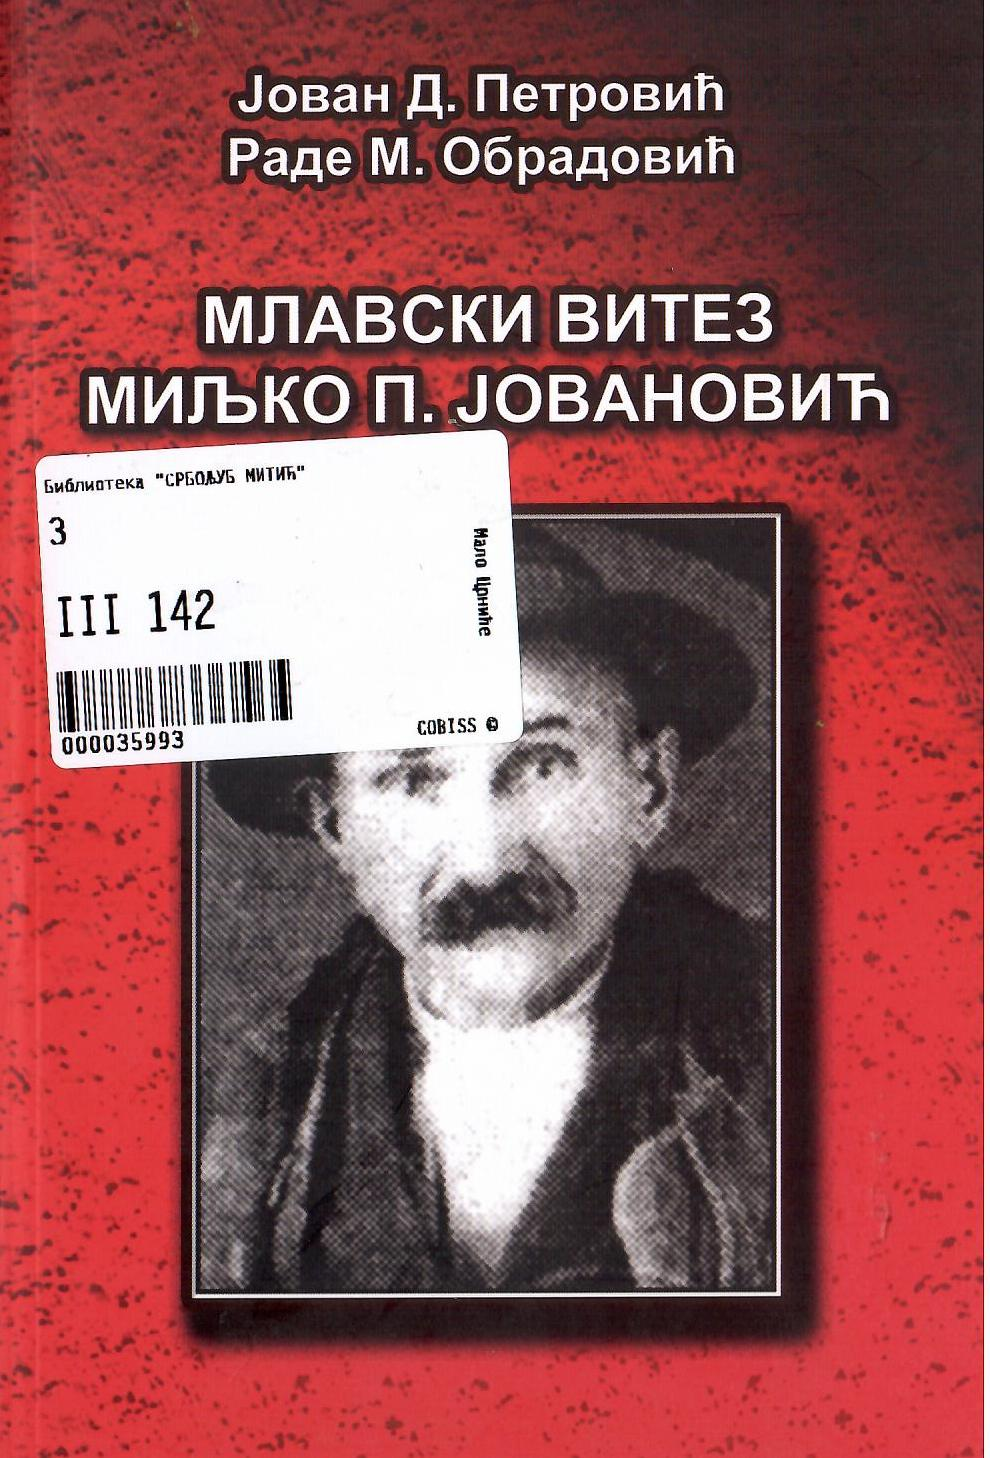 МЛАВСКИ ВИТЕЗ МИЉКО Ш. ЈОВАНОВИЋ Корице књигe